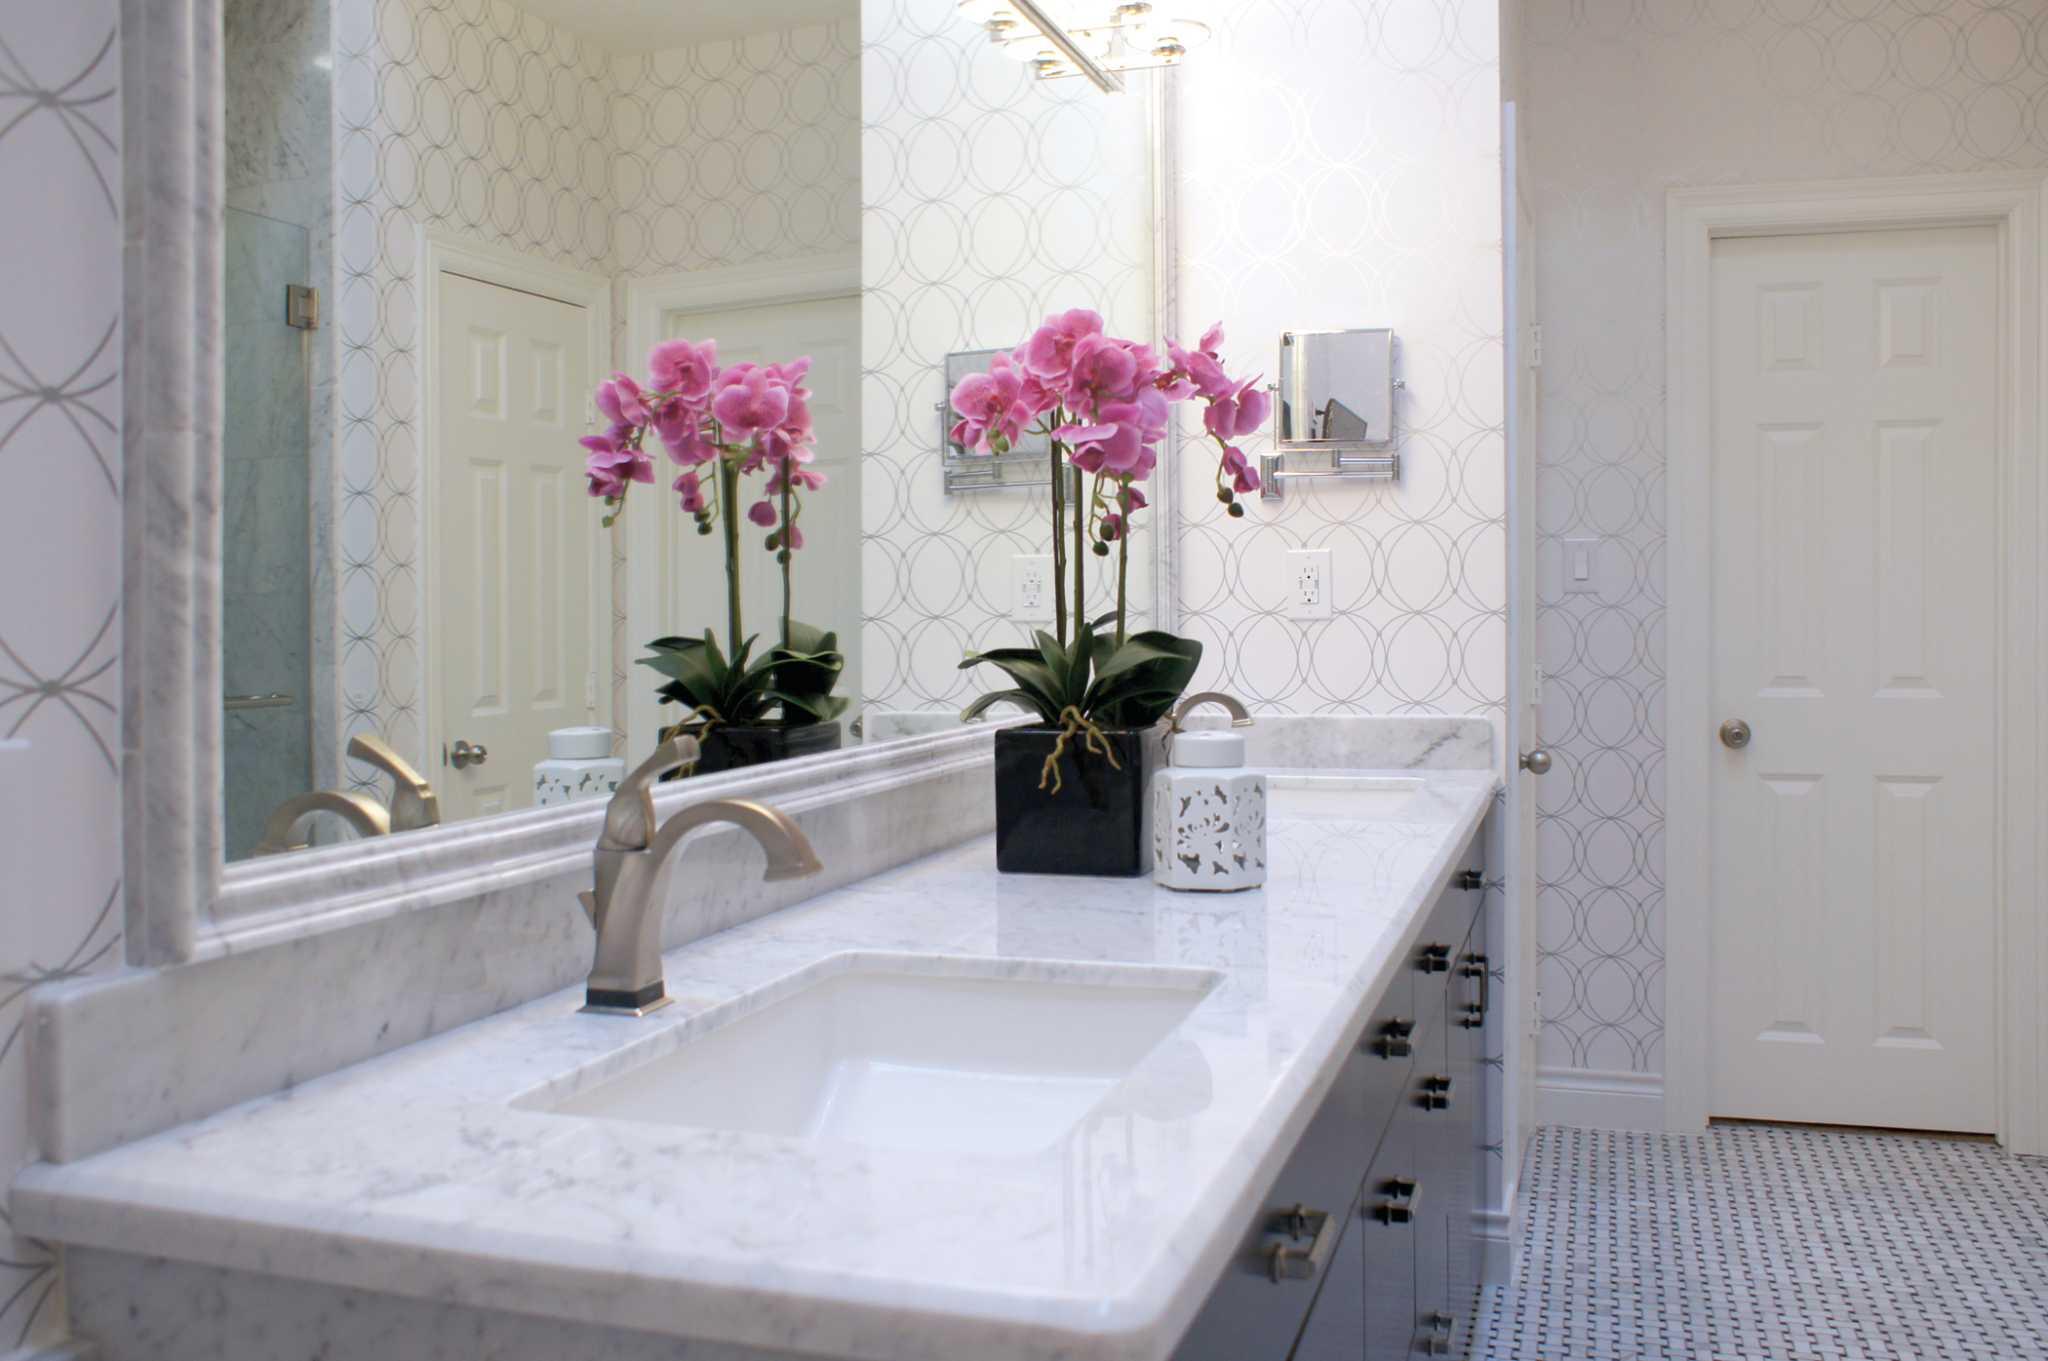 Bathroom Design Do 39 S And Don 39 Ts To Help Modernize Your Space San Antonio Express News